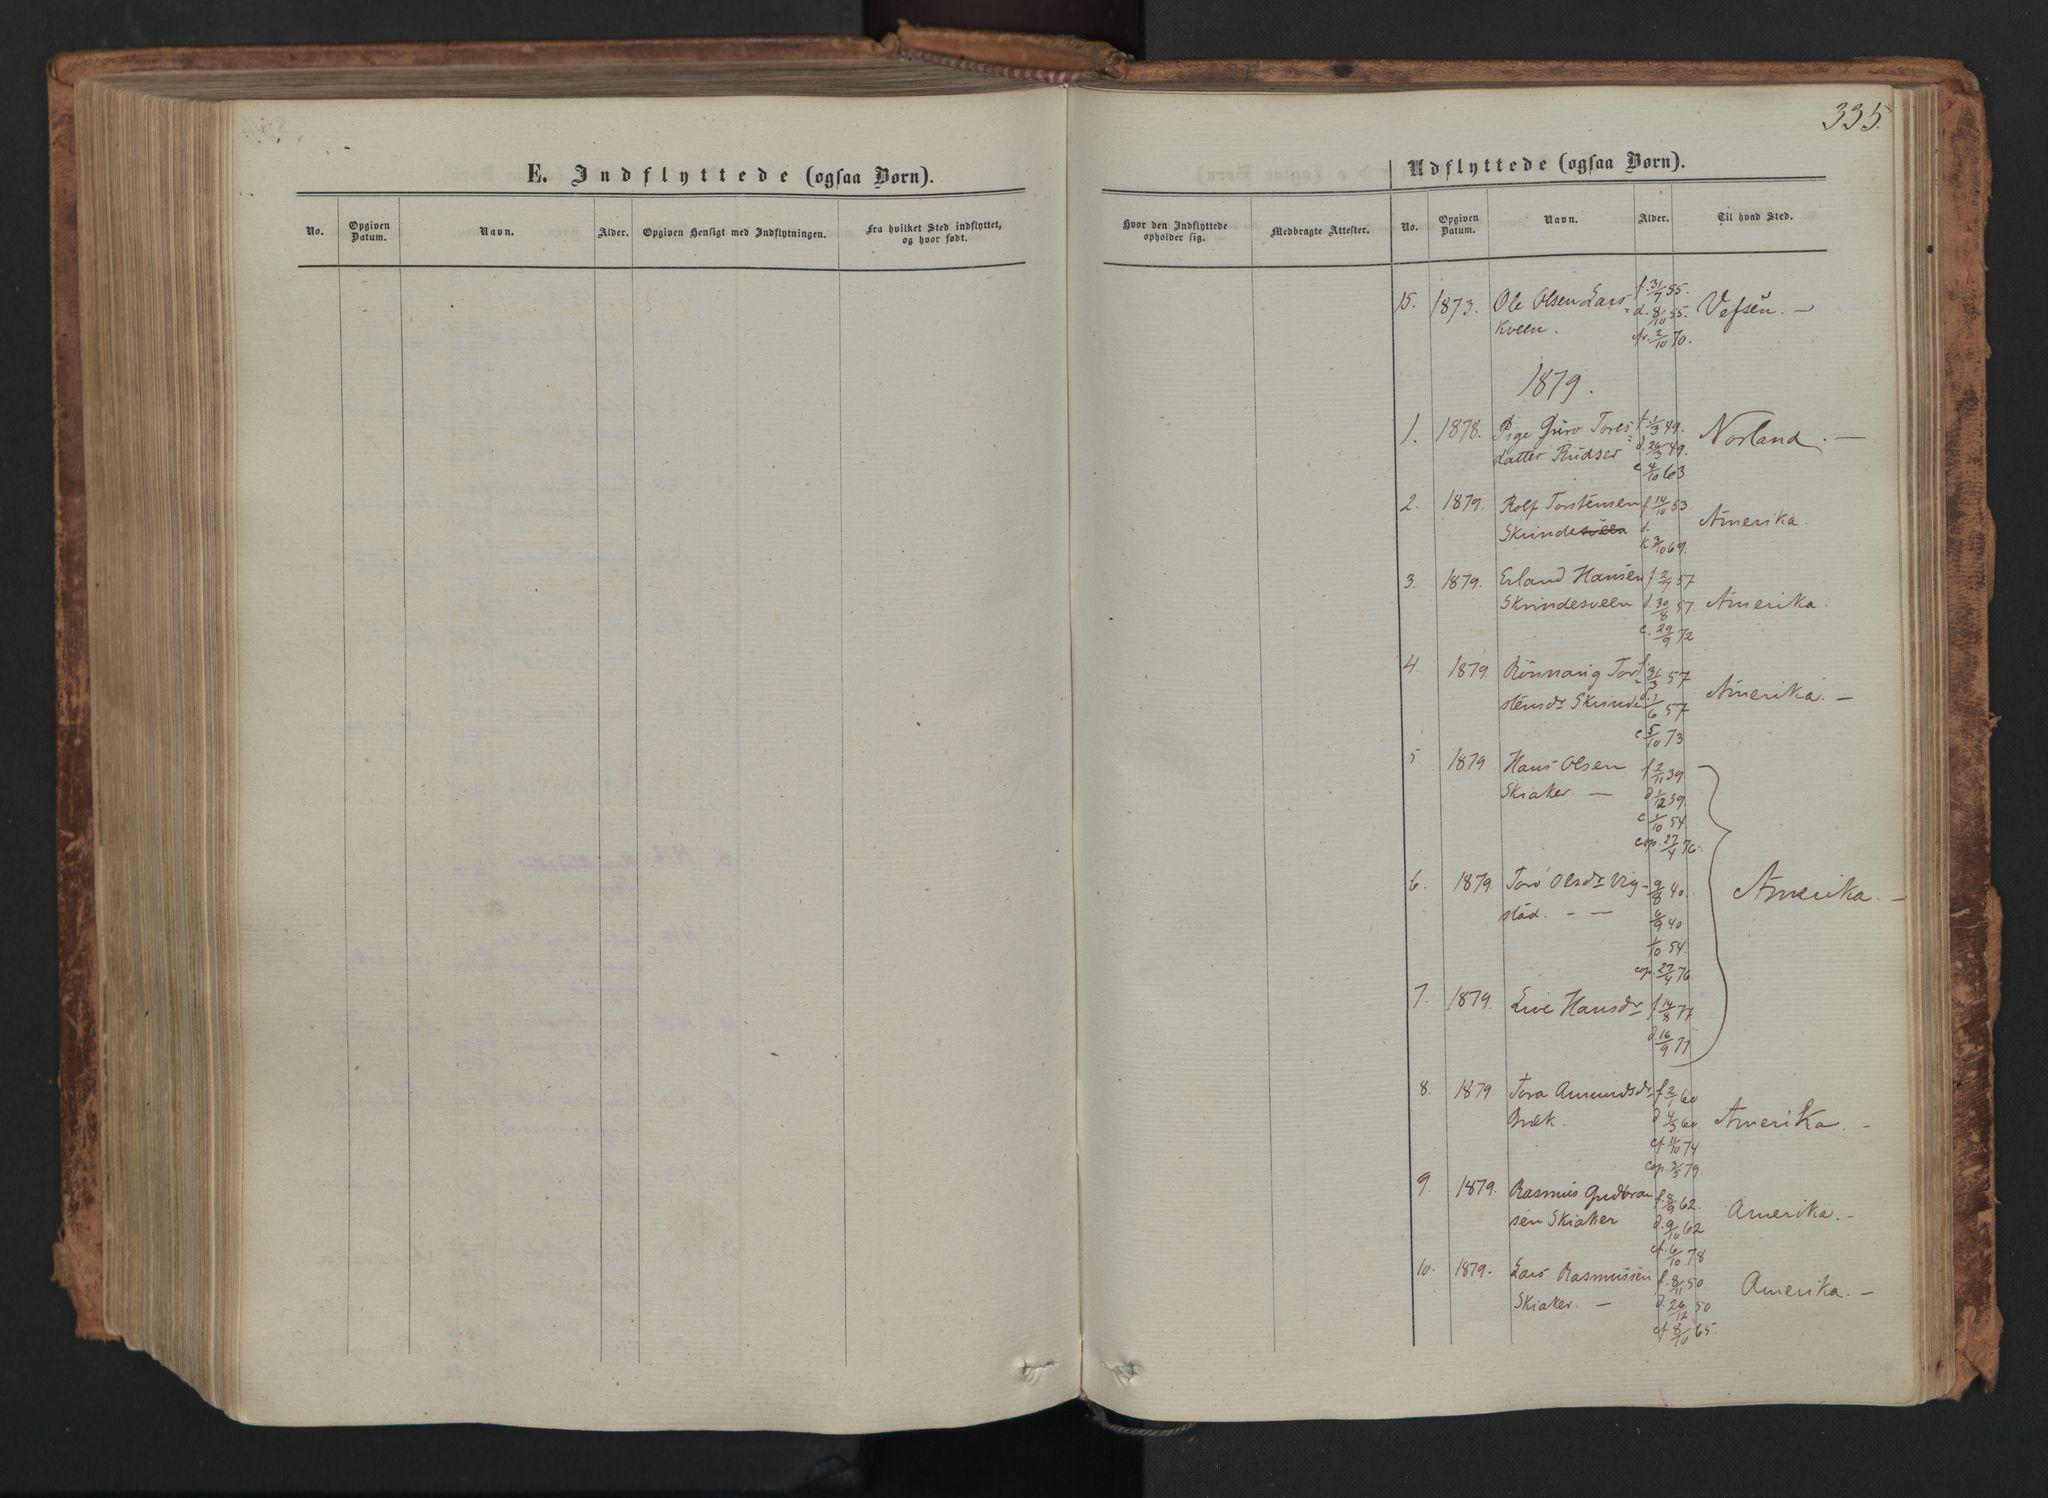 SAH, Skjåk prestekontor, Ministerialbok nr. 1, 1863-1879, s. 335